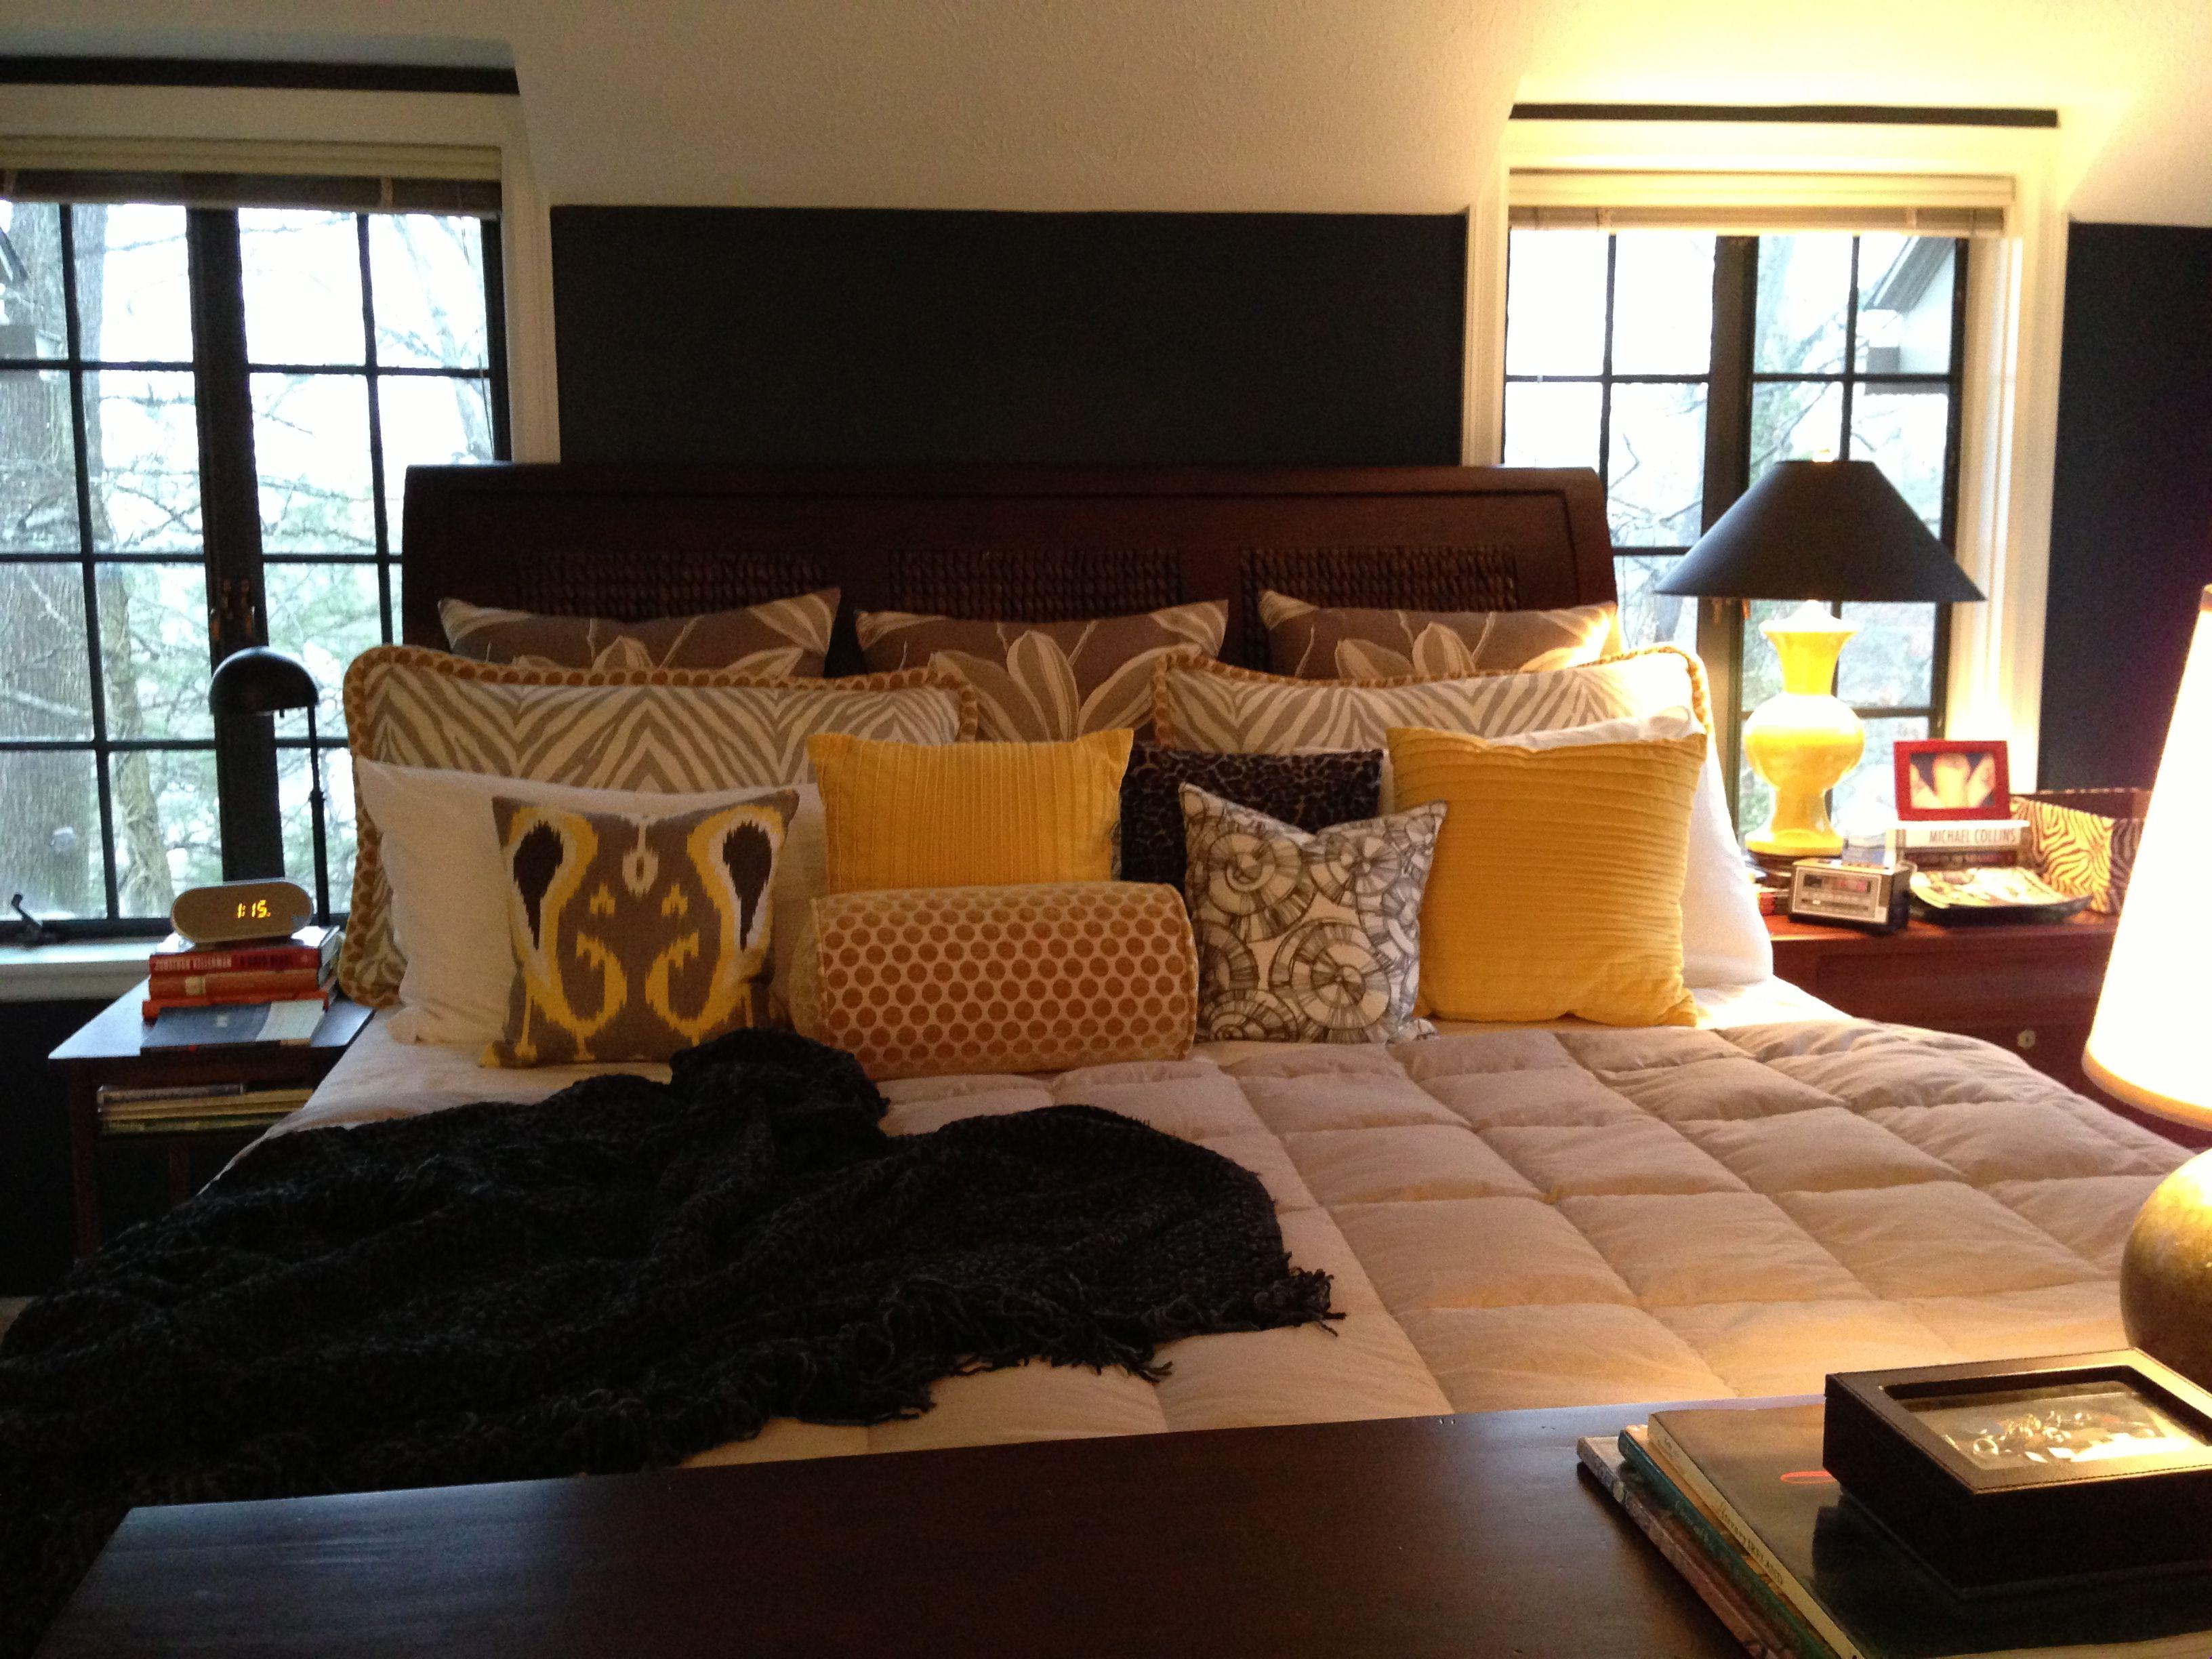 Master bedroom color schemes  New master bedroom color scheme  Color  Pinterest  Master bedroom